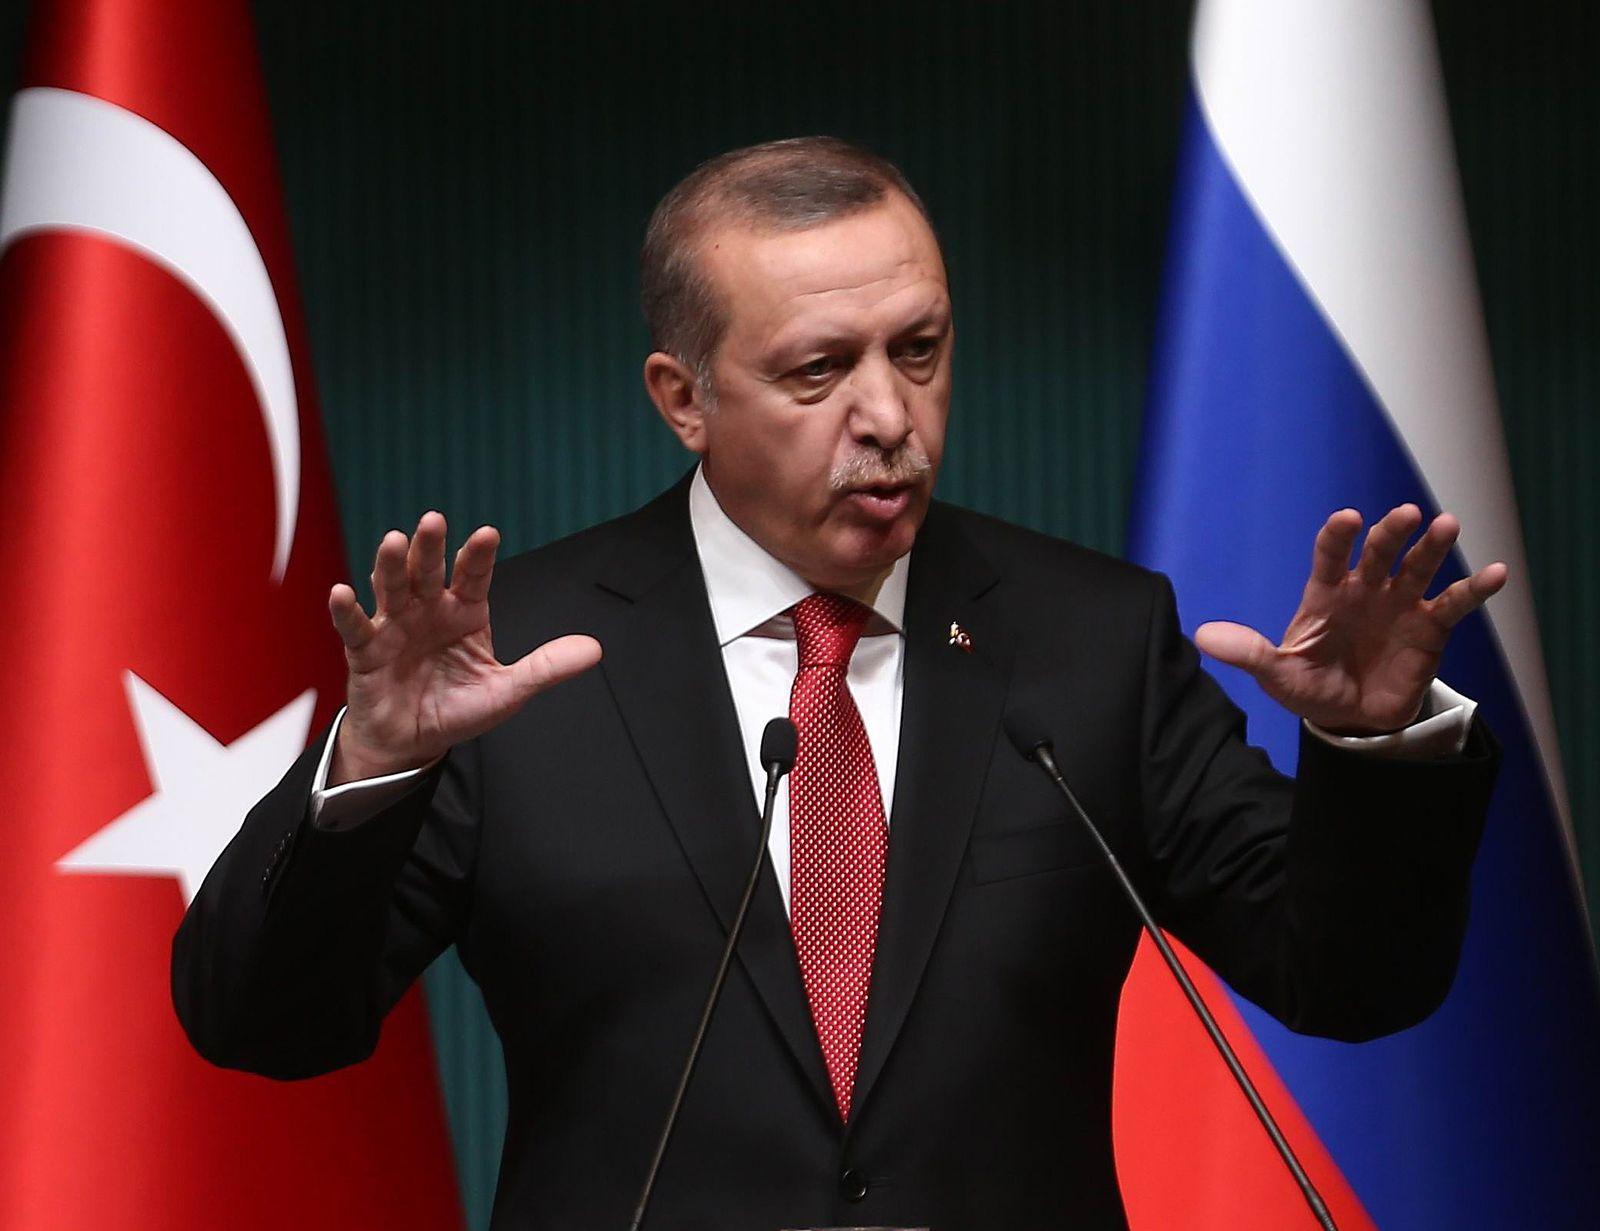 TURKEY-RUSSIA-DIPLOMACY-ENERGY